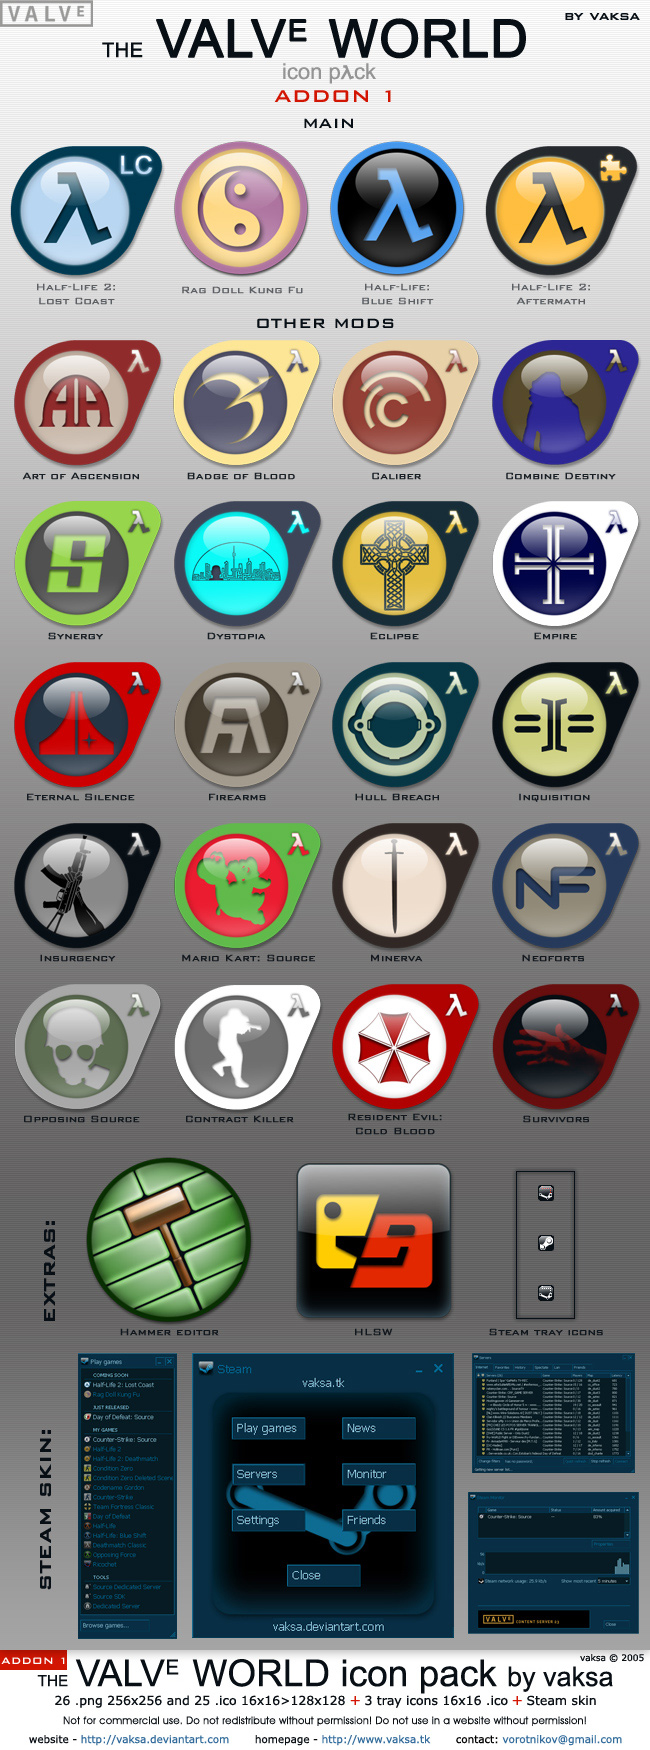 Valve World icon pack ADDon 1